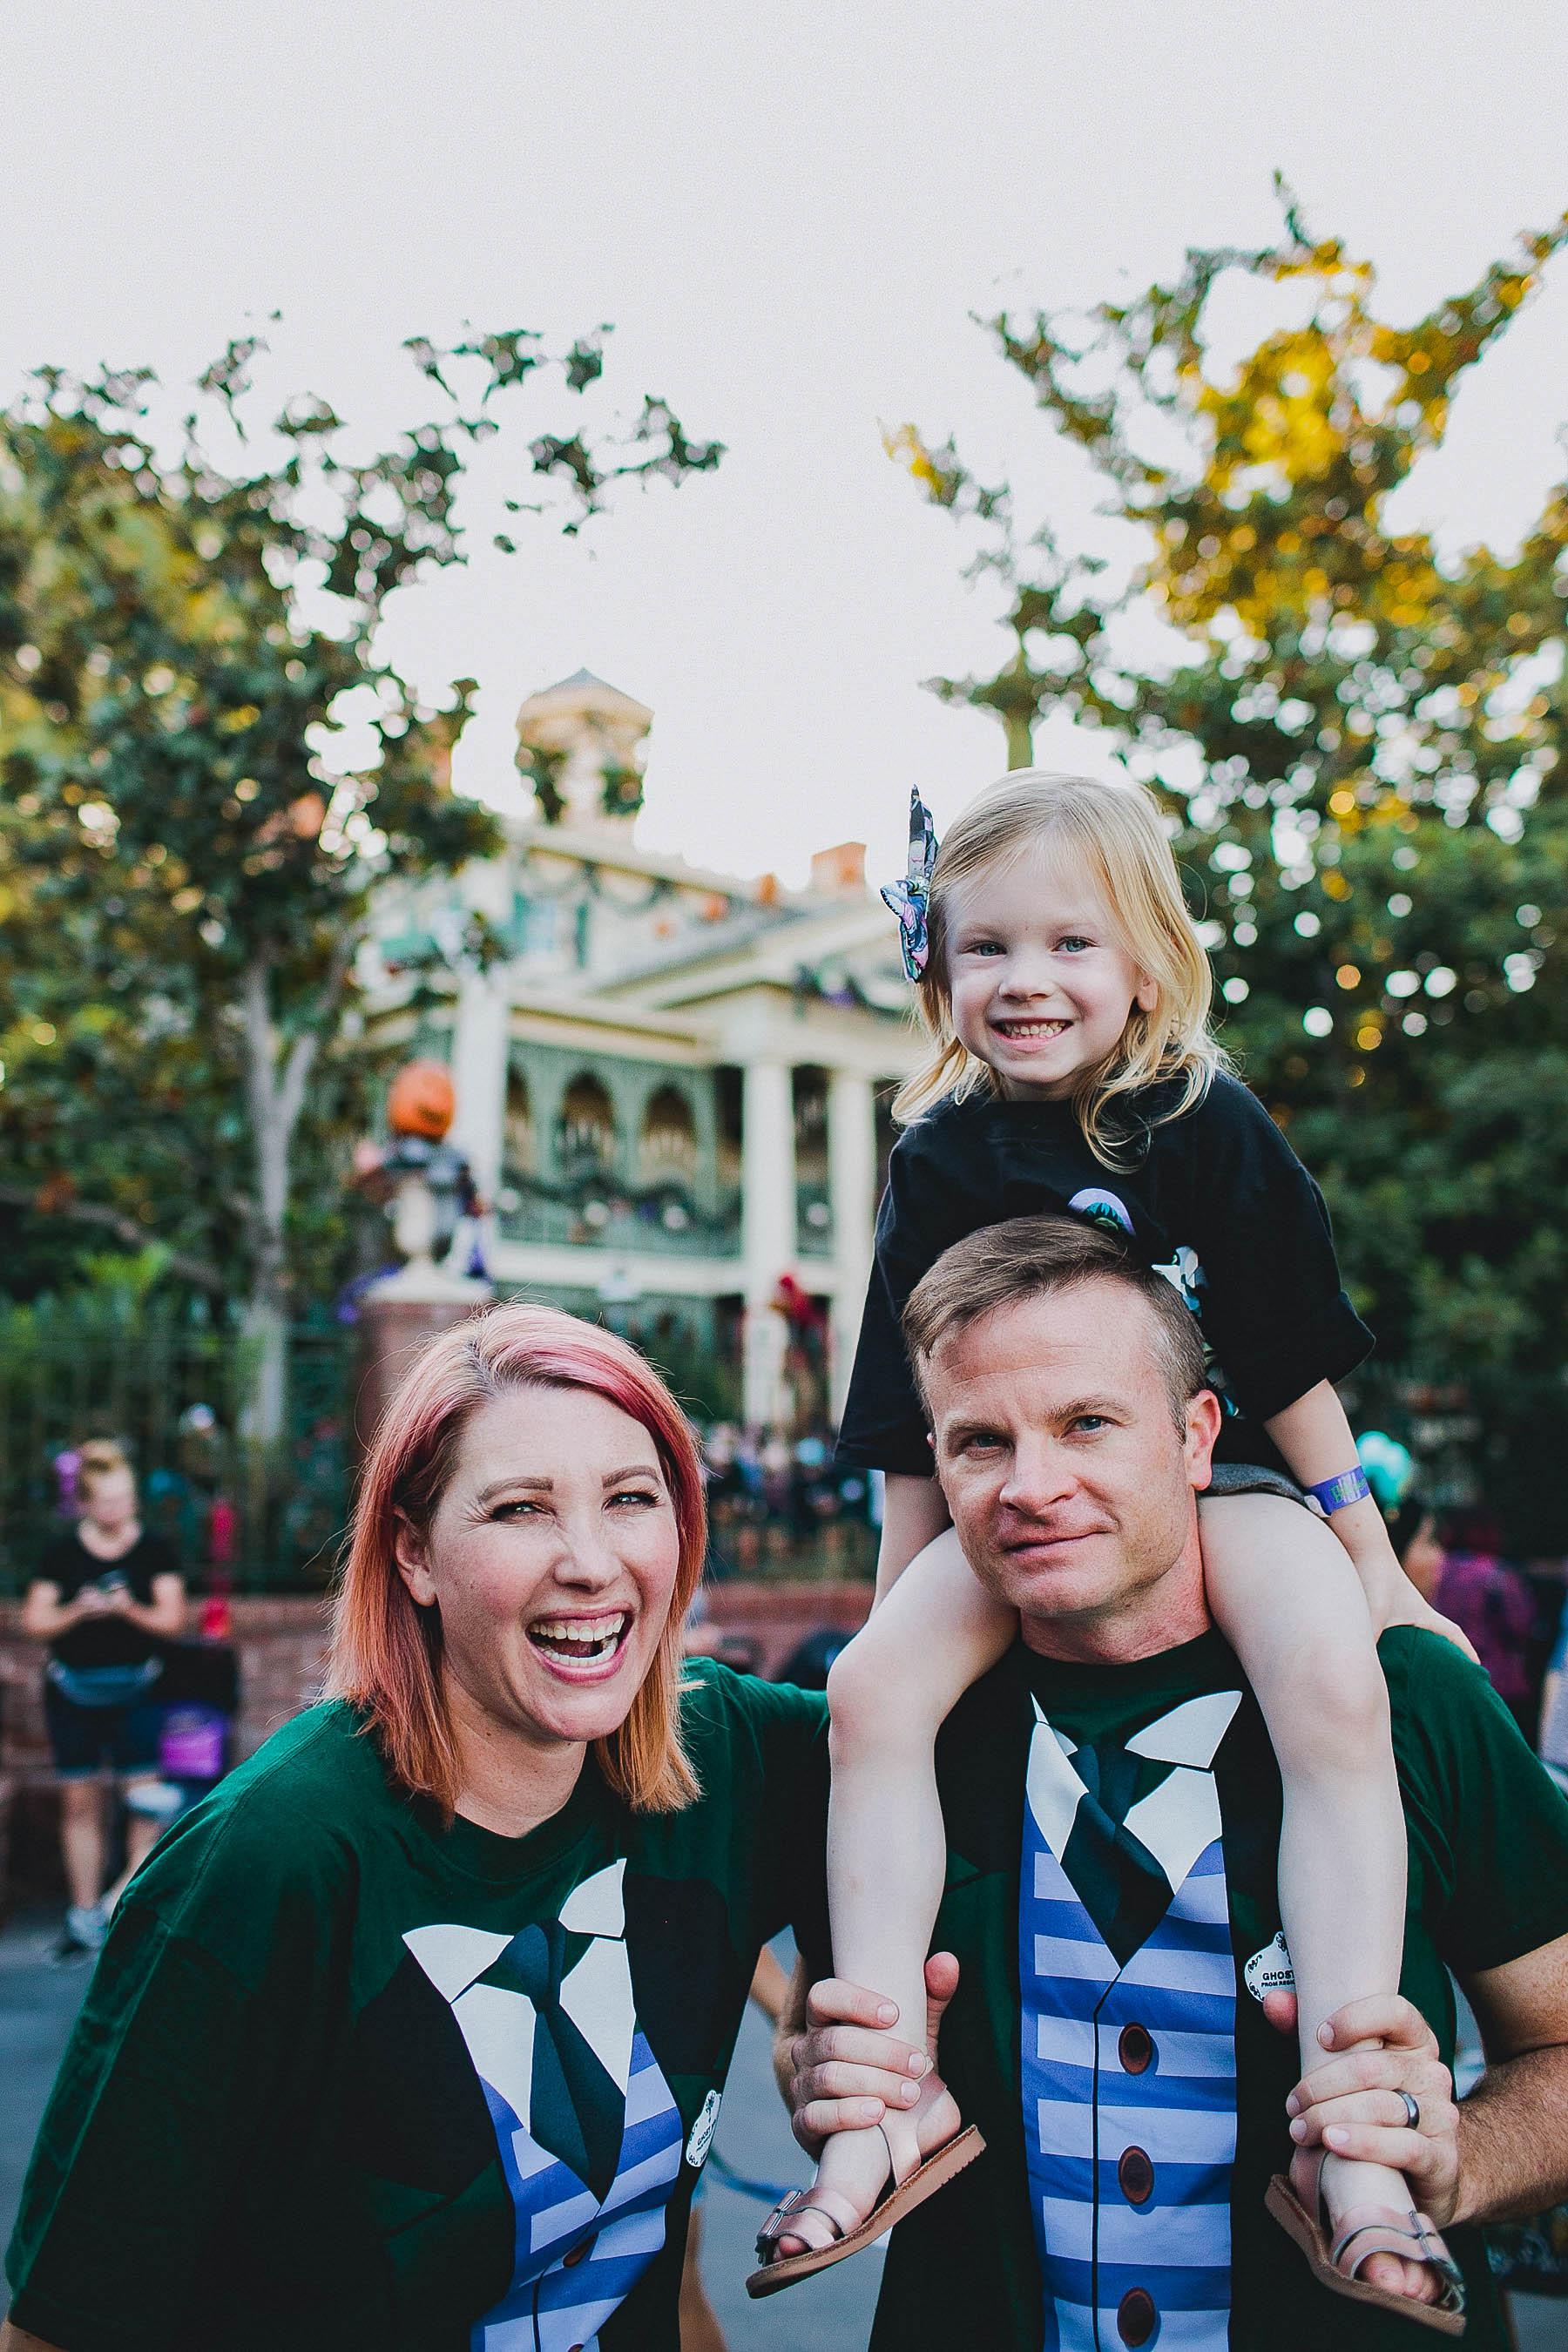 Looking for Disneyland Activities that aren't rides? This list of Disneyland Secrets has 100 of them!